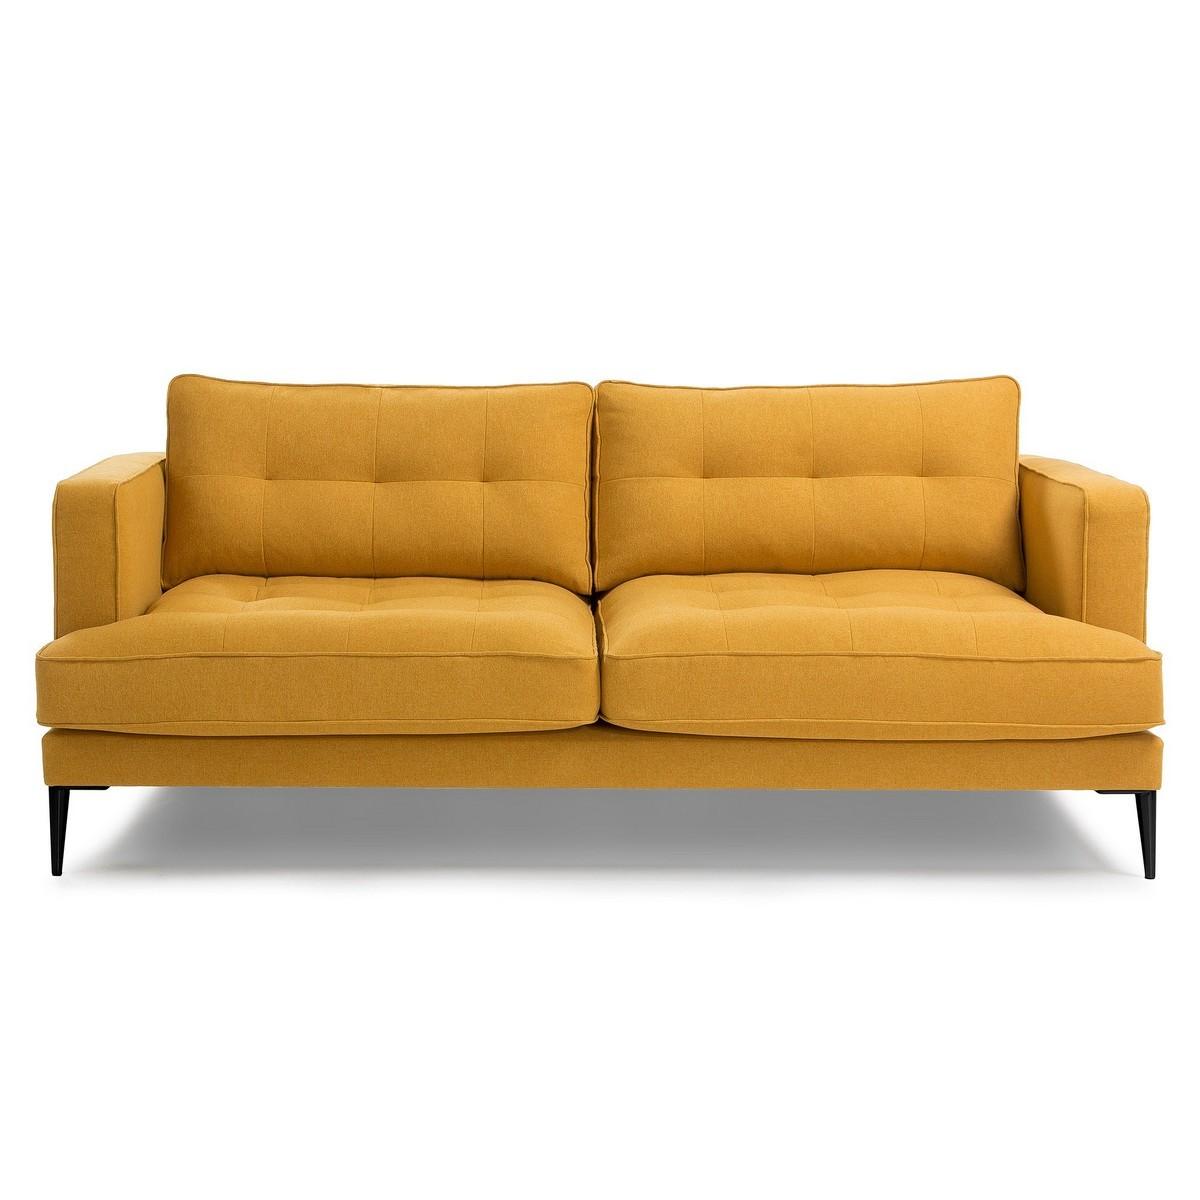 Bellavista Tufted Fabric Sofa, 3 Seater, Mustard